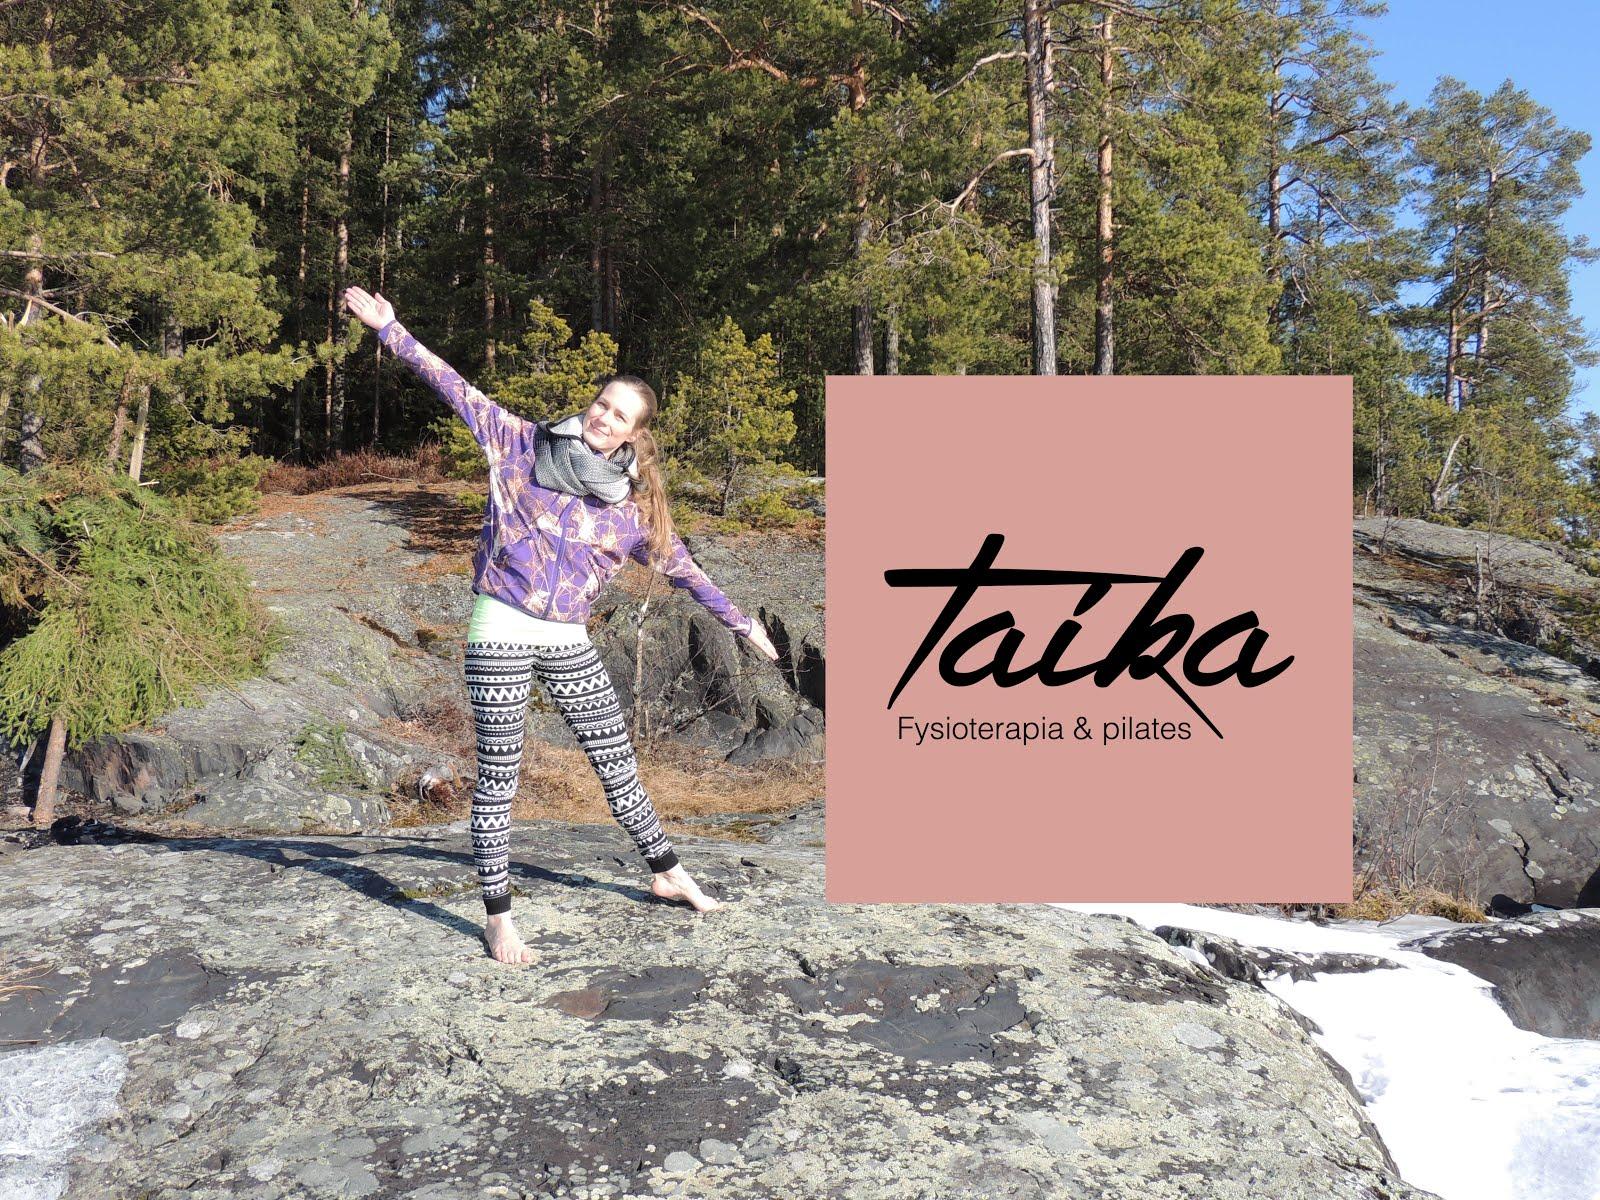 Fysioterapia & Pilates TAIKA